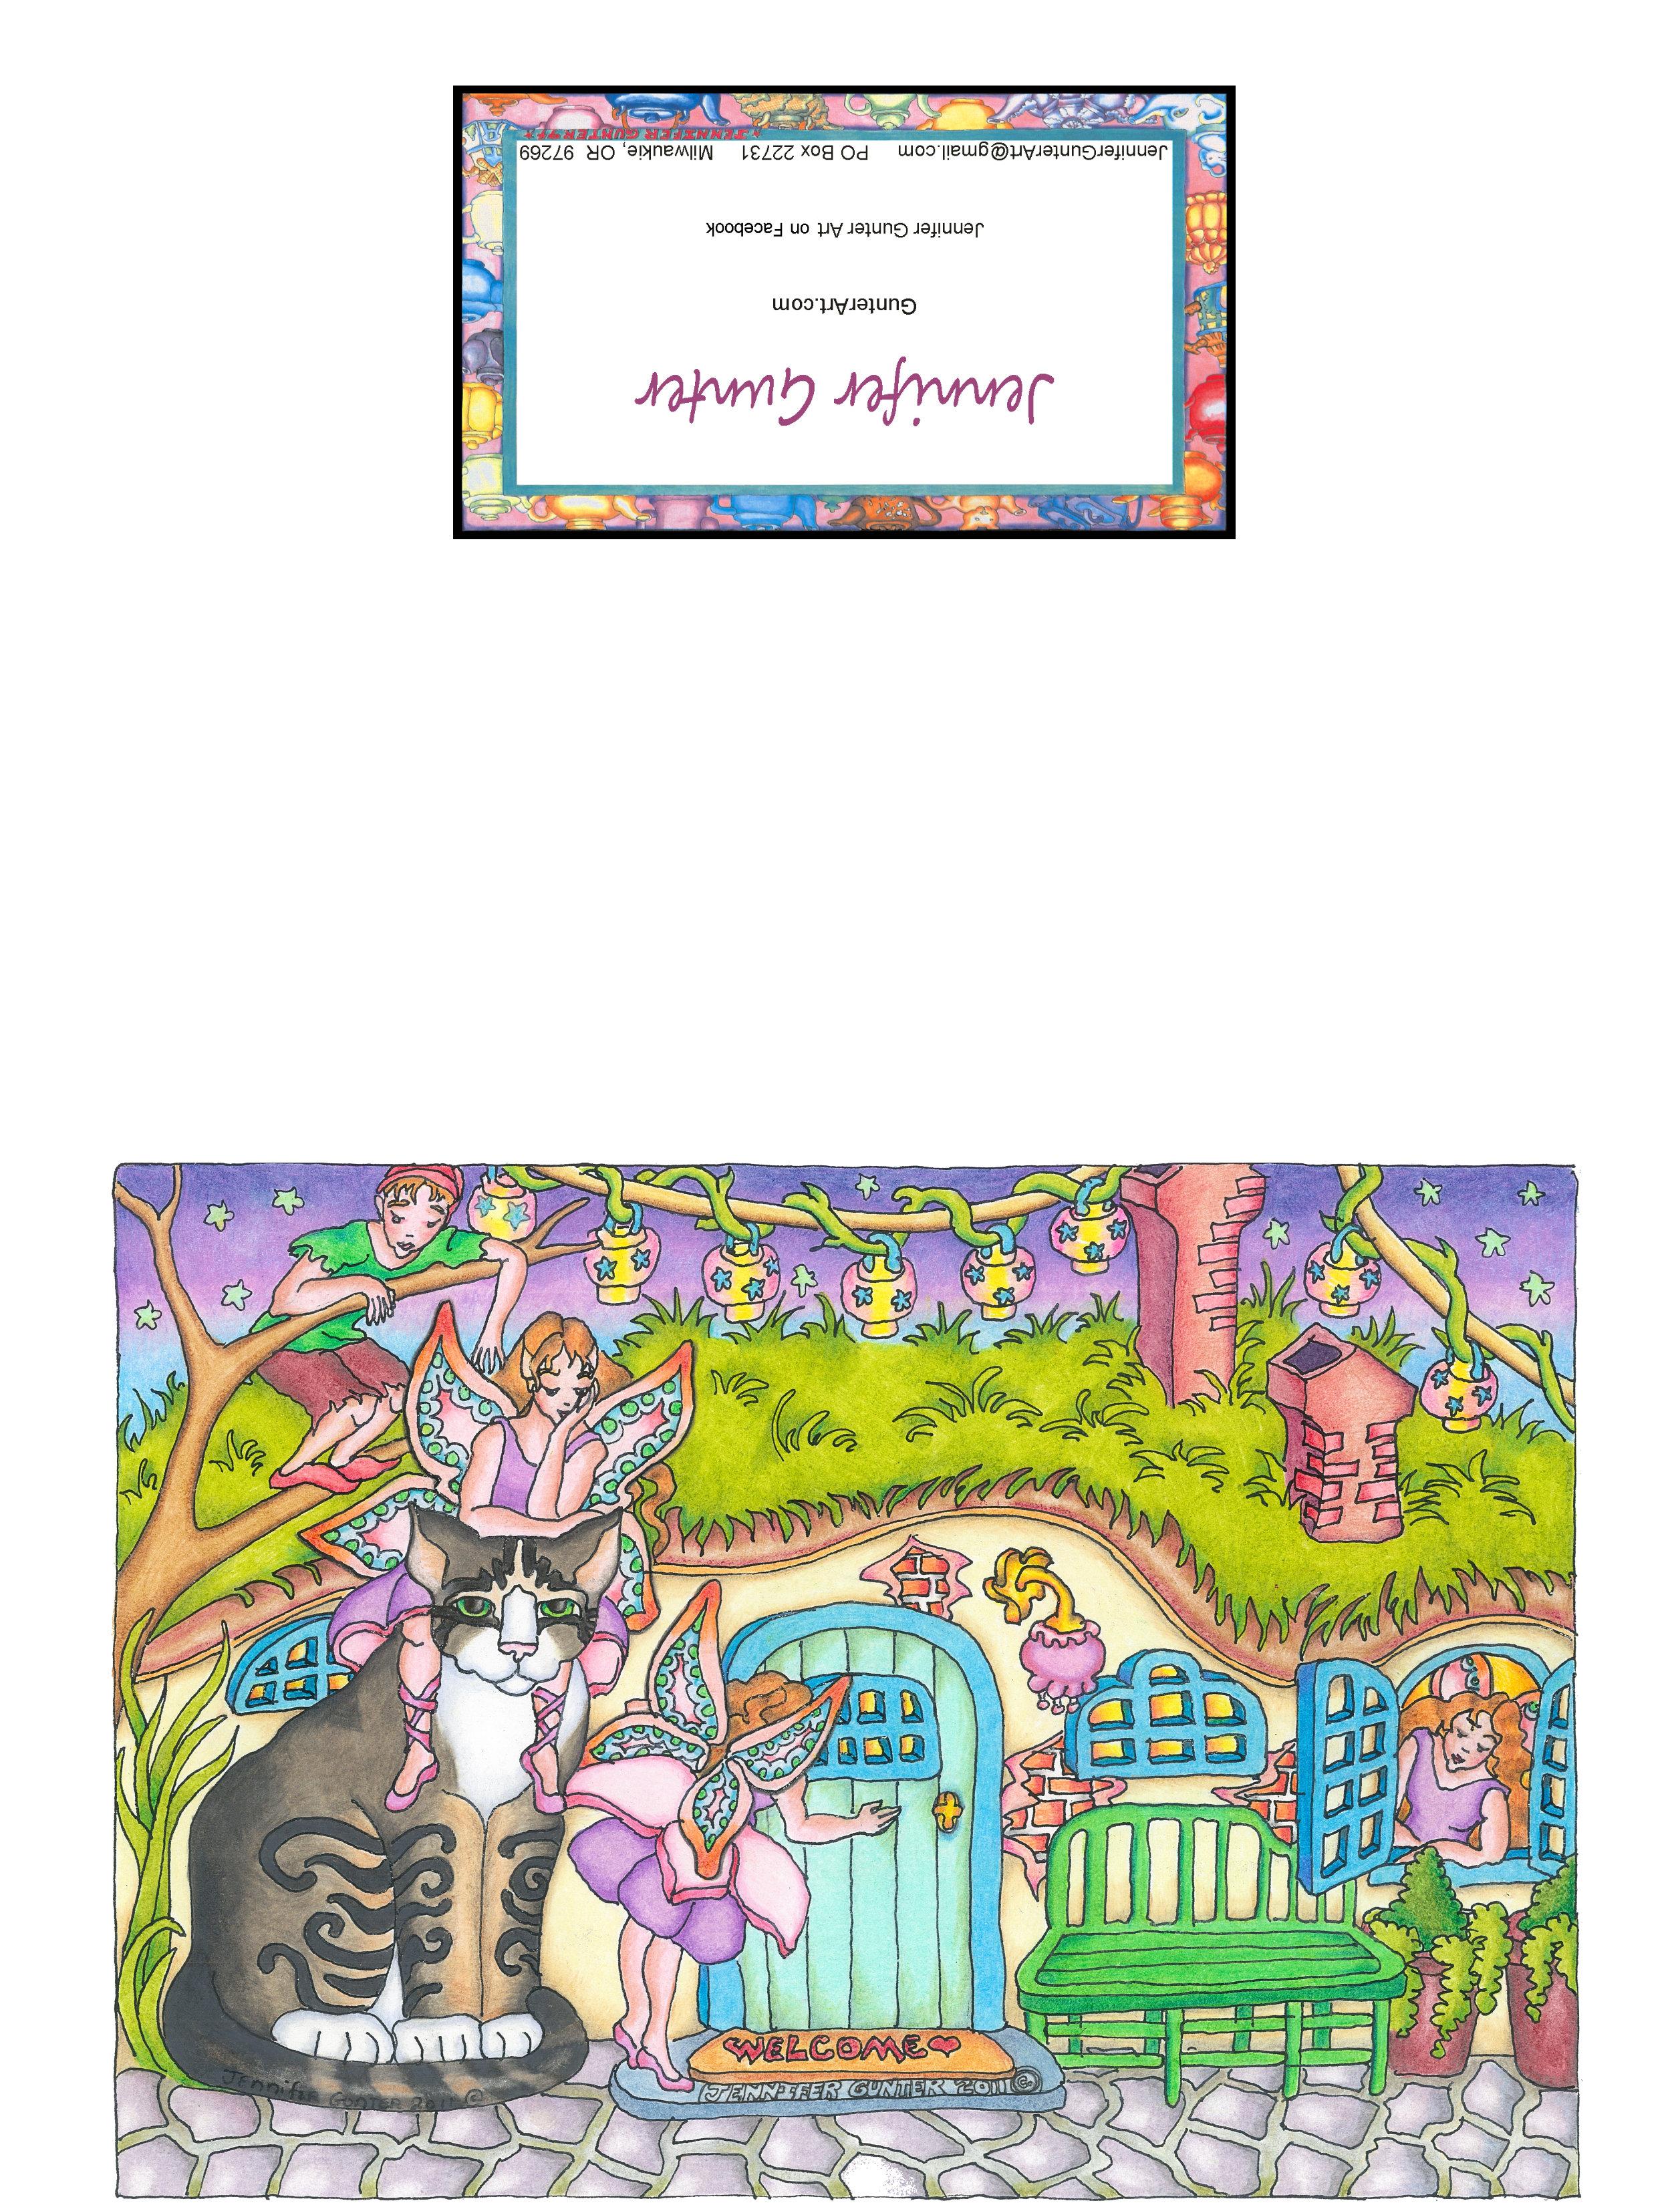 FairyAndTabby_GreetingCard